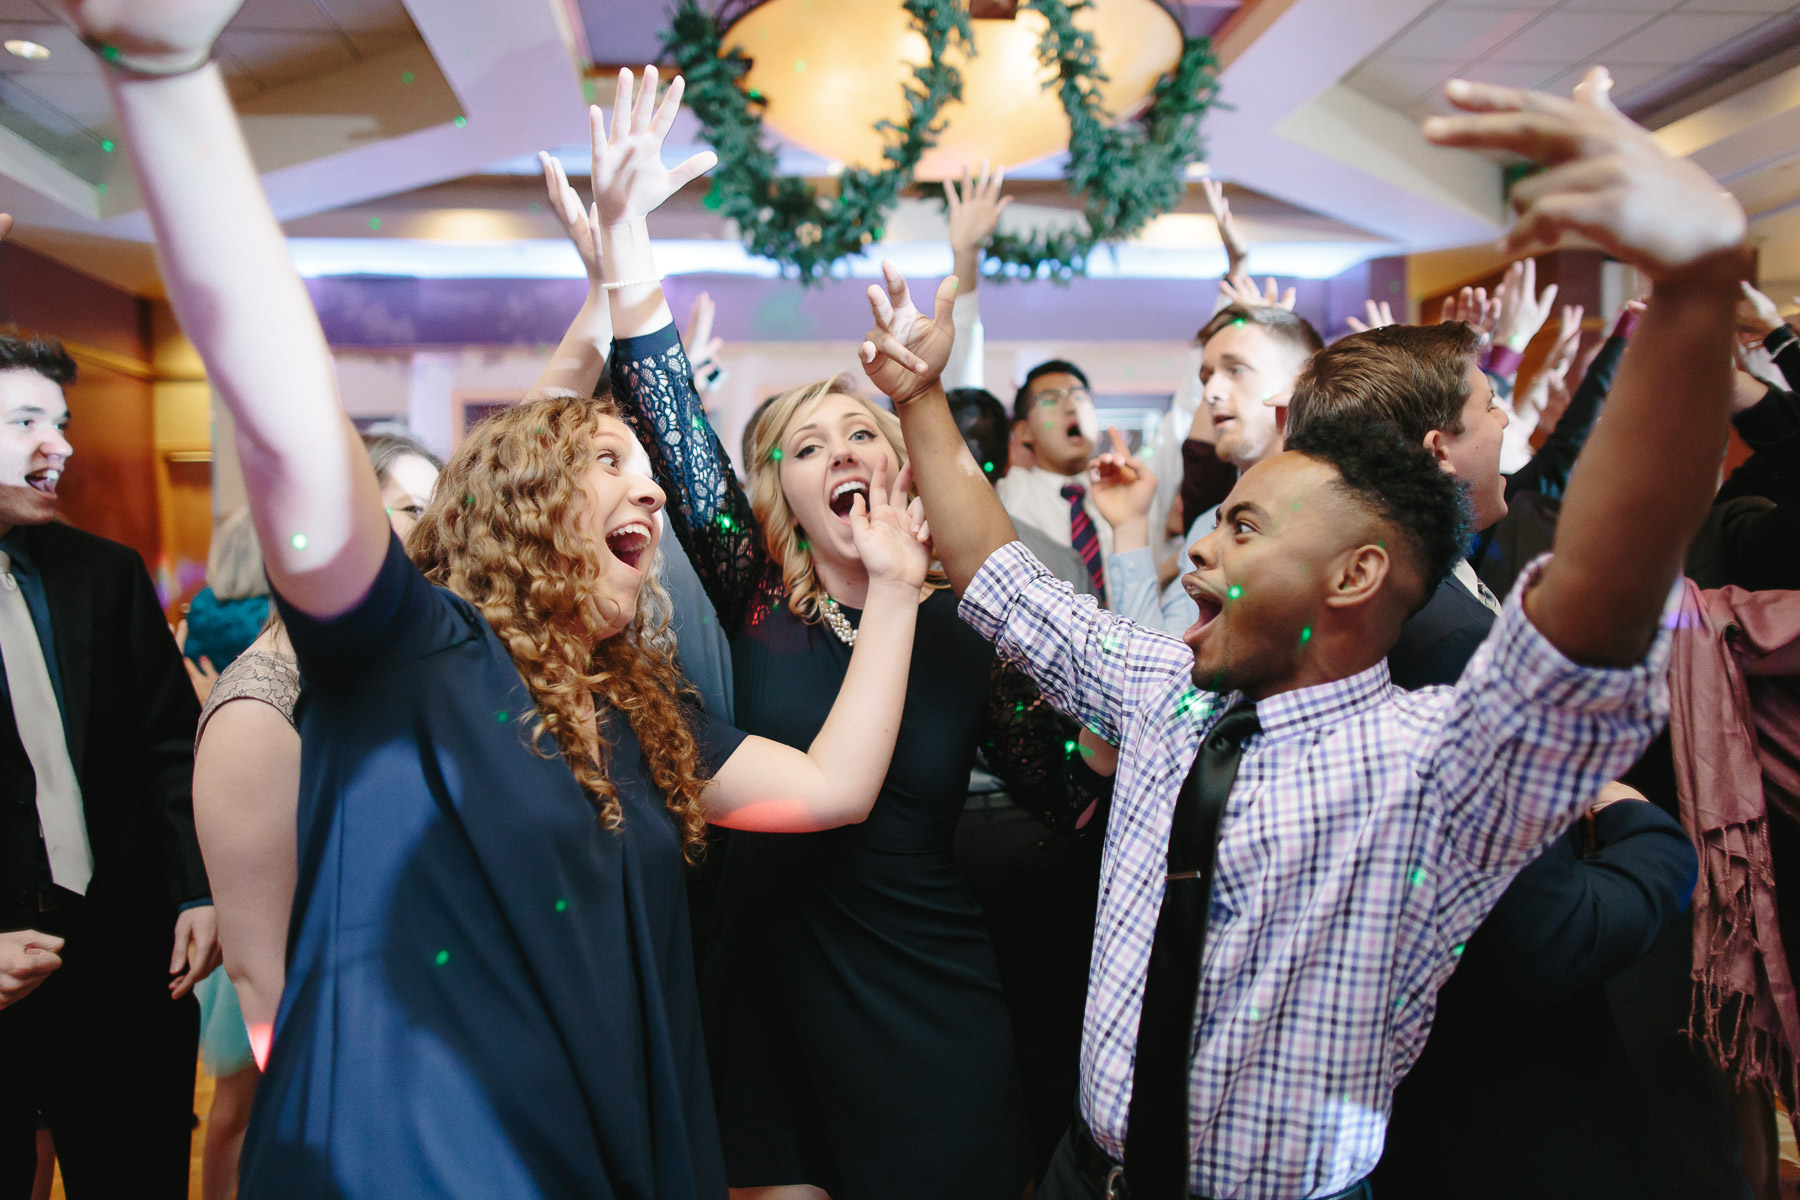 161210-Luxium-Weddings-Arizona-Matt-Jenny-Anthem-Golf-Country-Club-1068.jpg